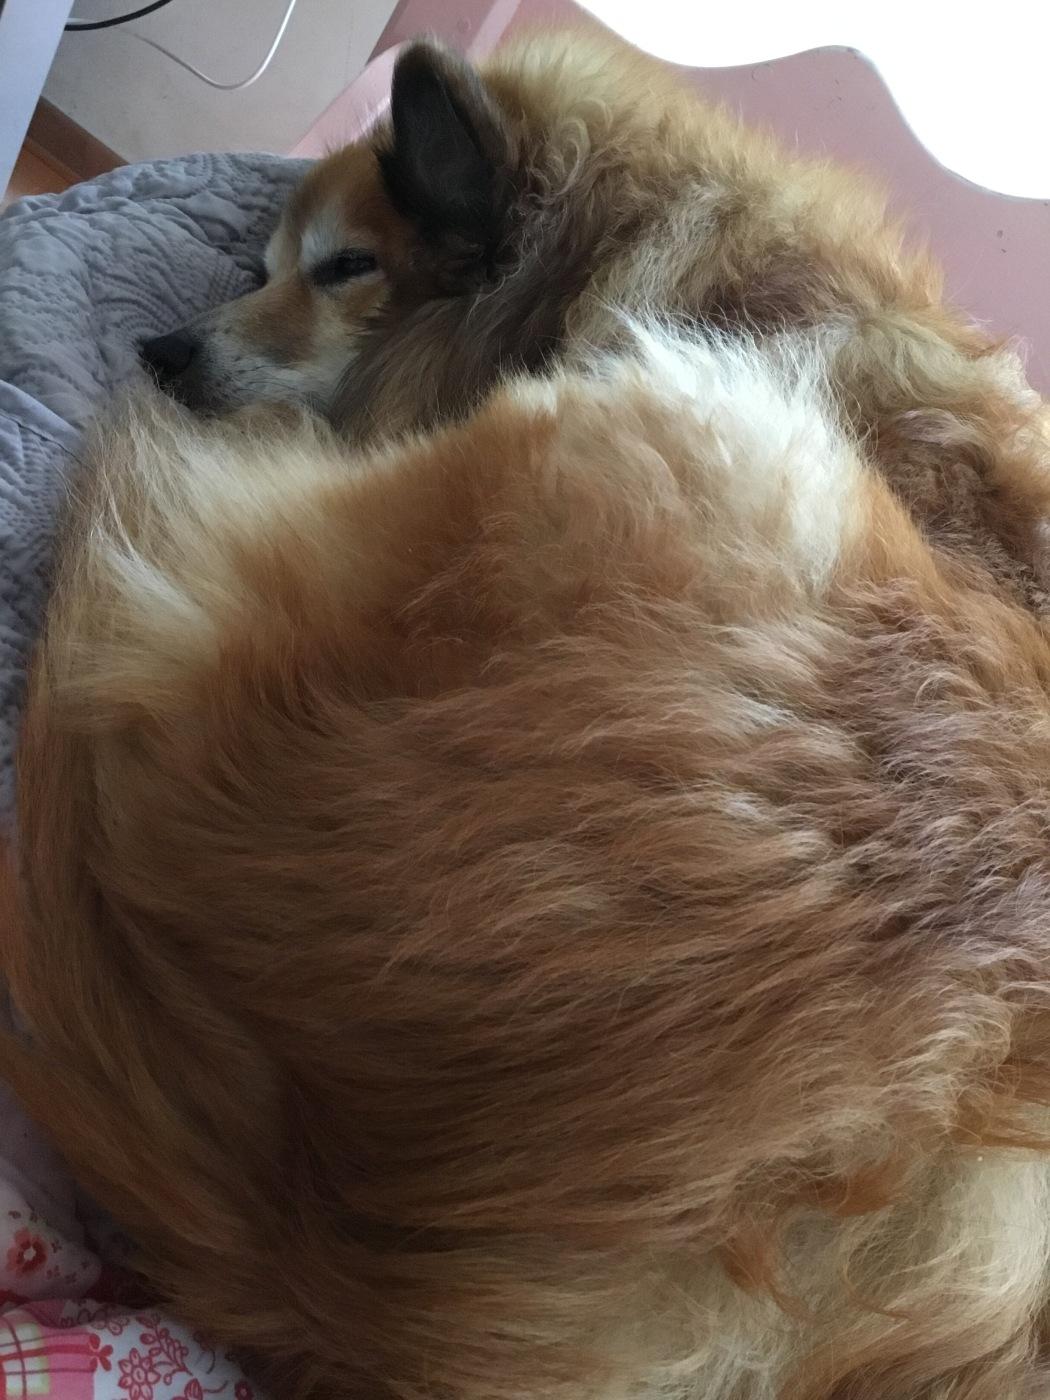 Miss Bera Ijslandse Honden zwanger